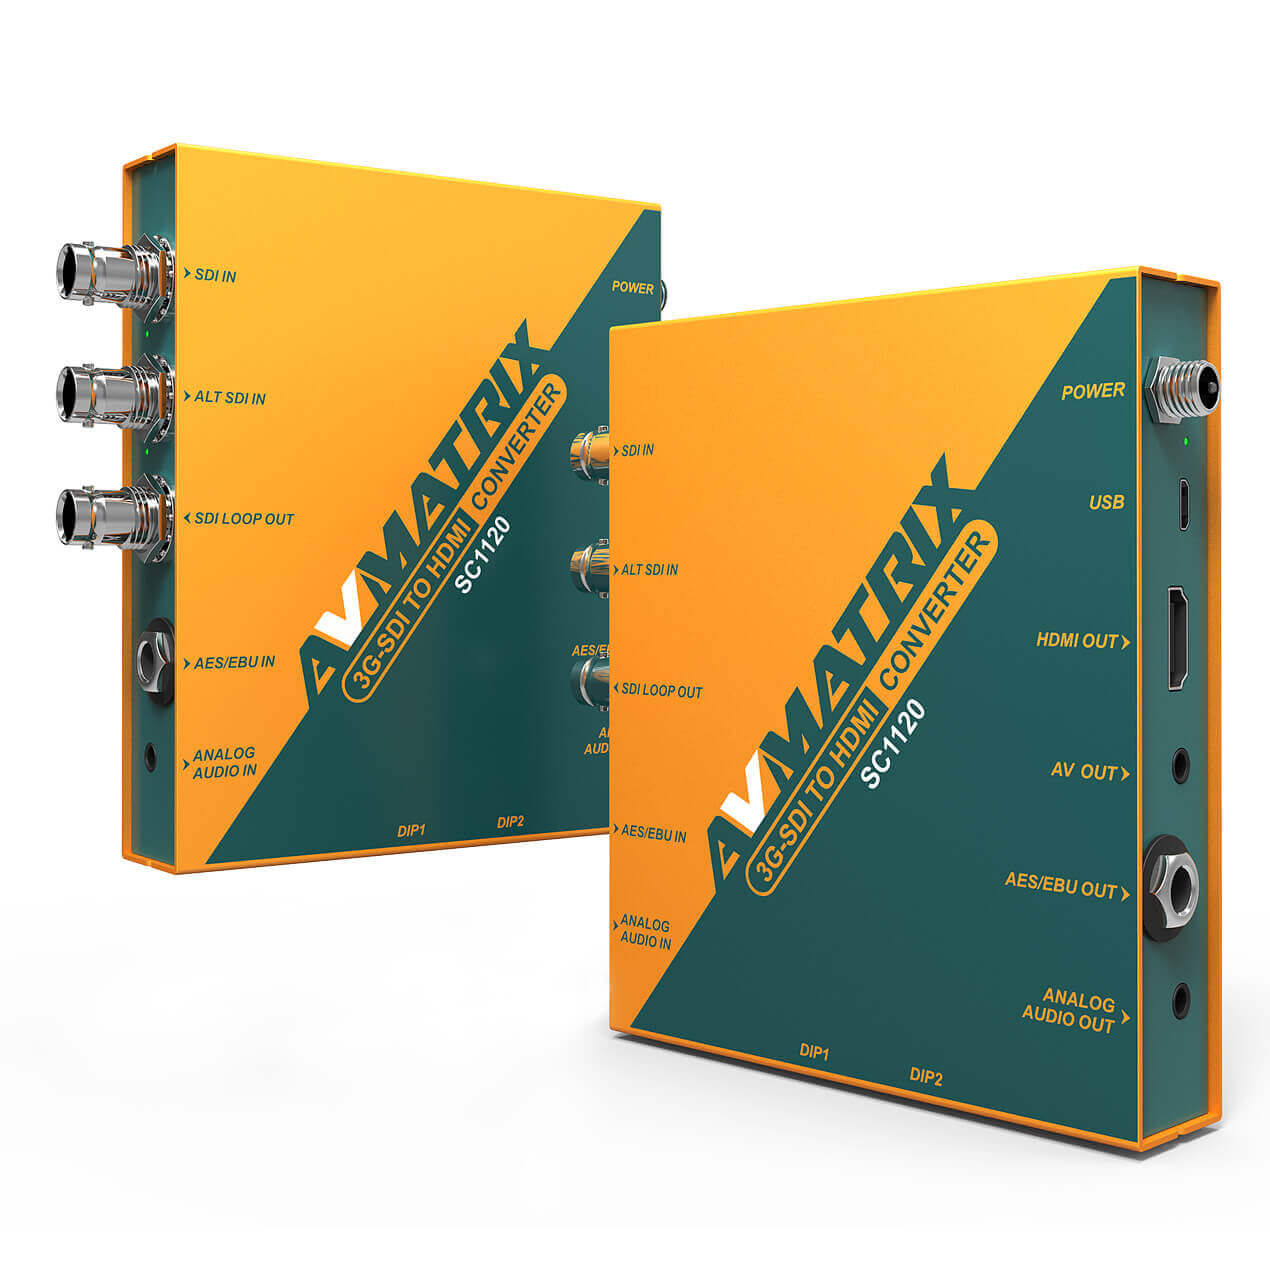 Bộ Converter 3G-SDI to HDMI & AV  Avmatrix  SC1120